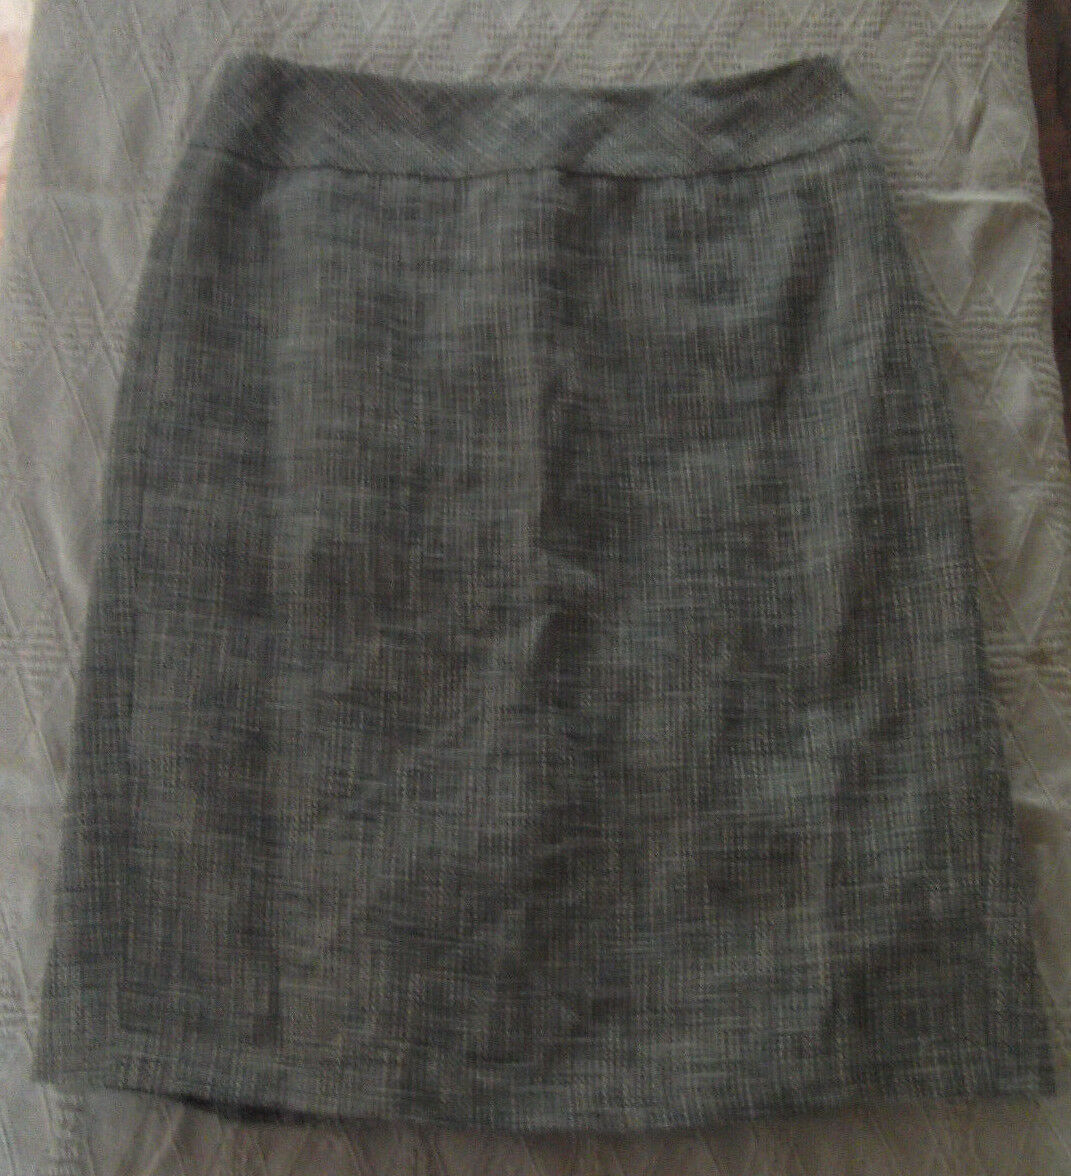 Ann Taylor bluee White & Beige Woven Cotton Linen Blend Skirt Misses Size 4